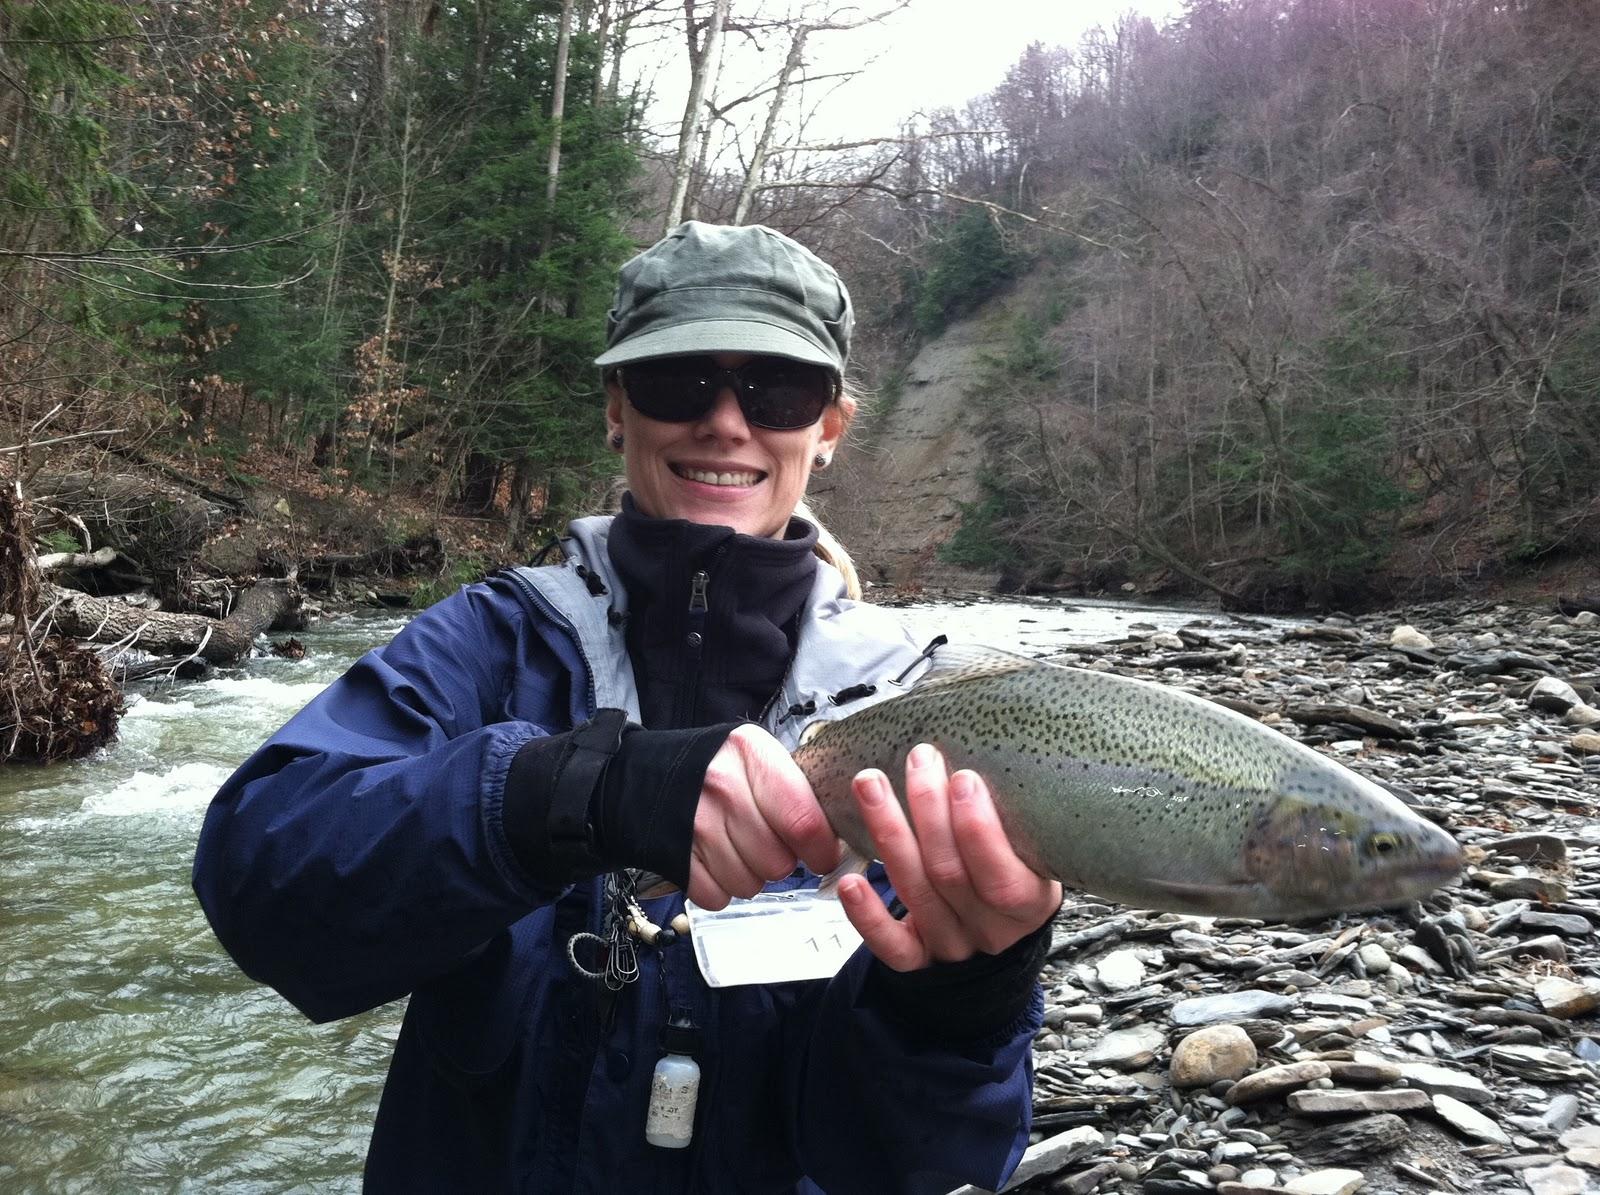 North western pennsylvania fly fishing november 2011 for Plenty of fish erie pa